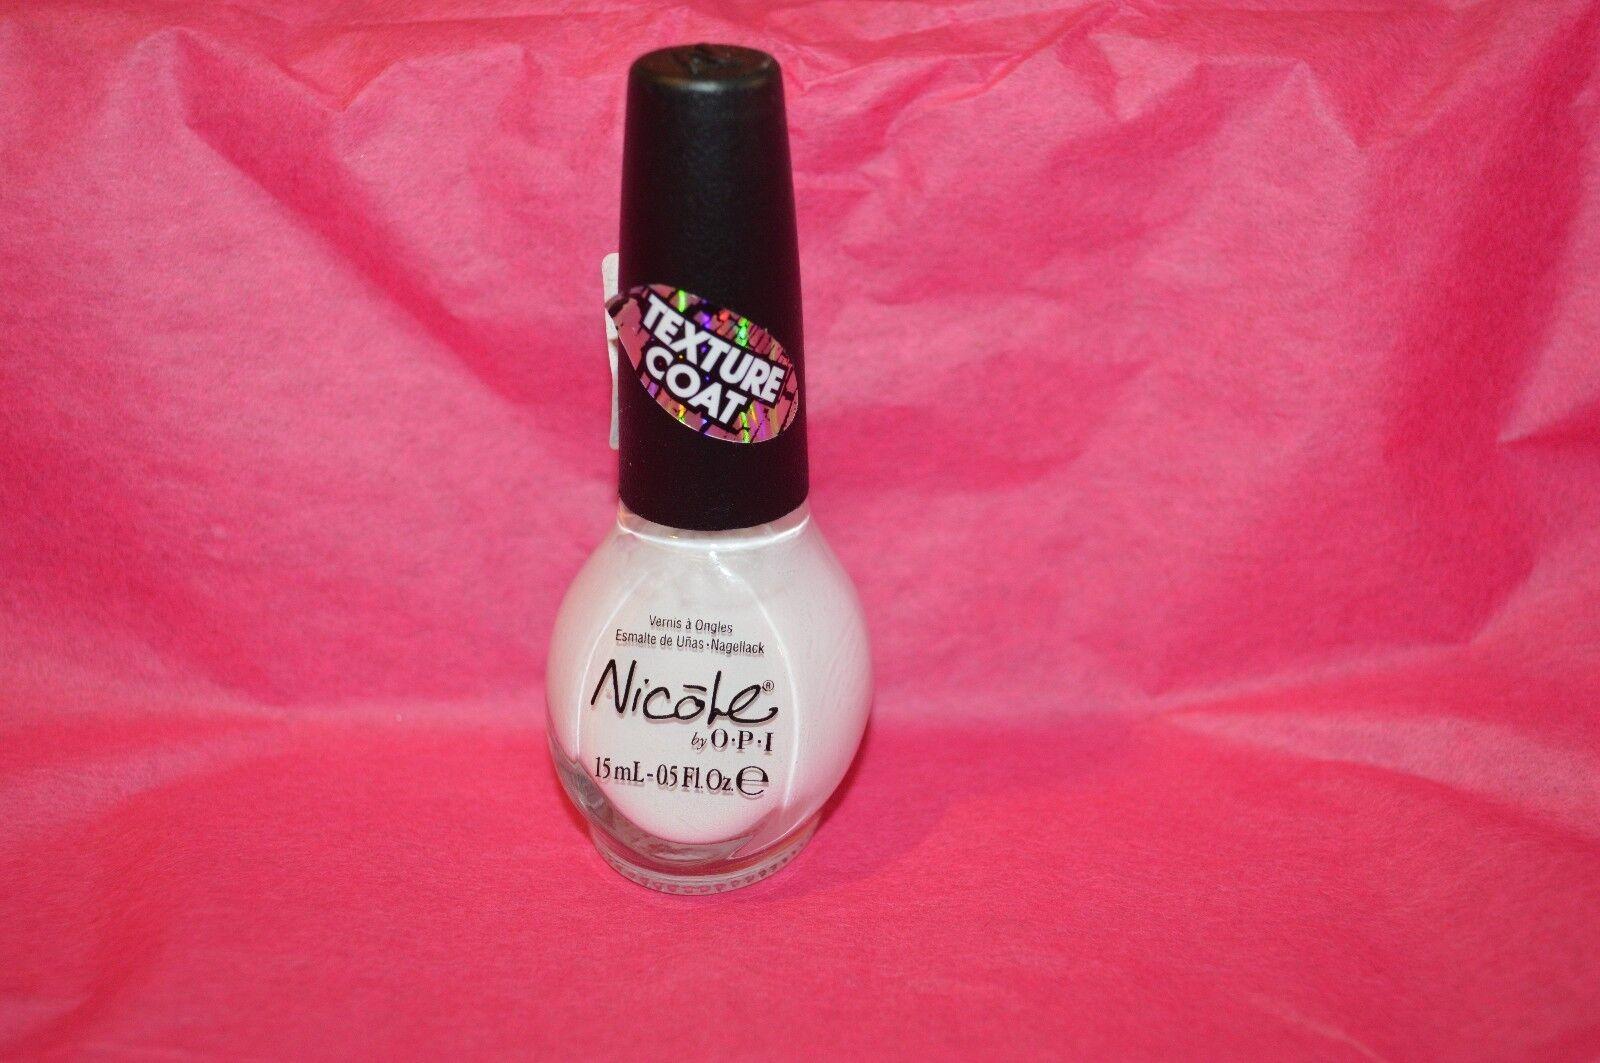 Nicole by OPI Textured Nail Polish #ni 380 White Texture | eBay